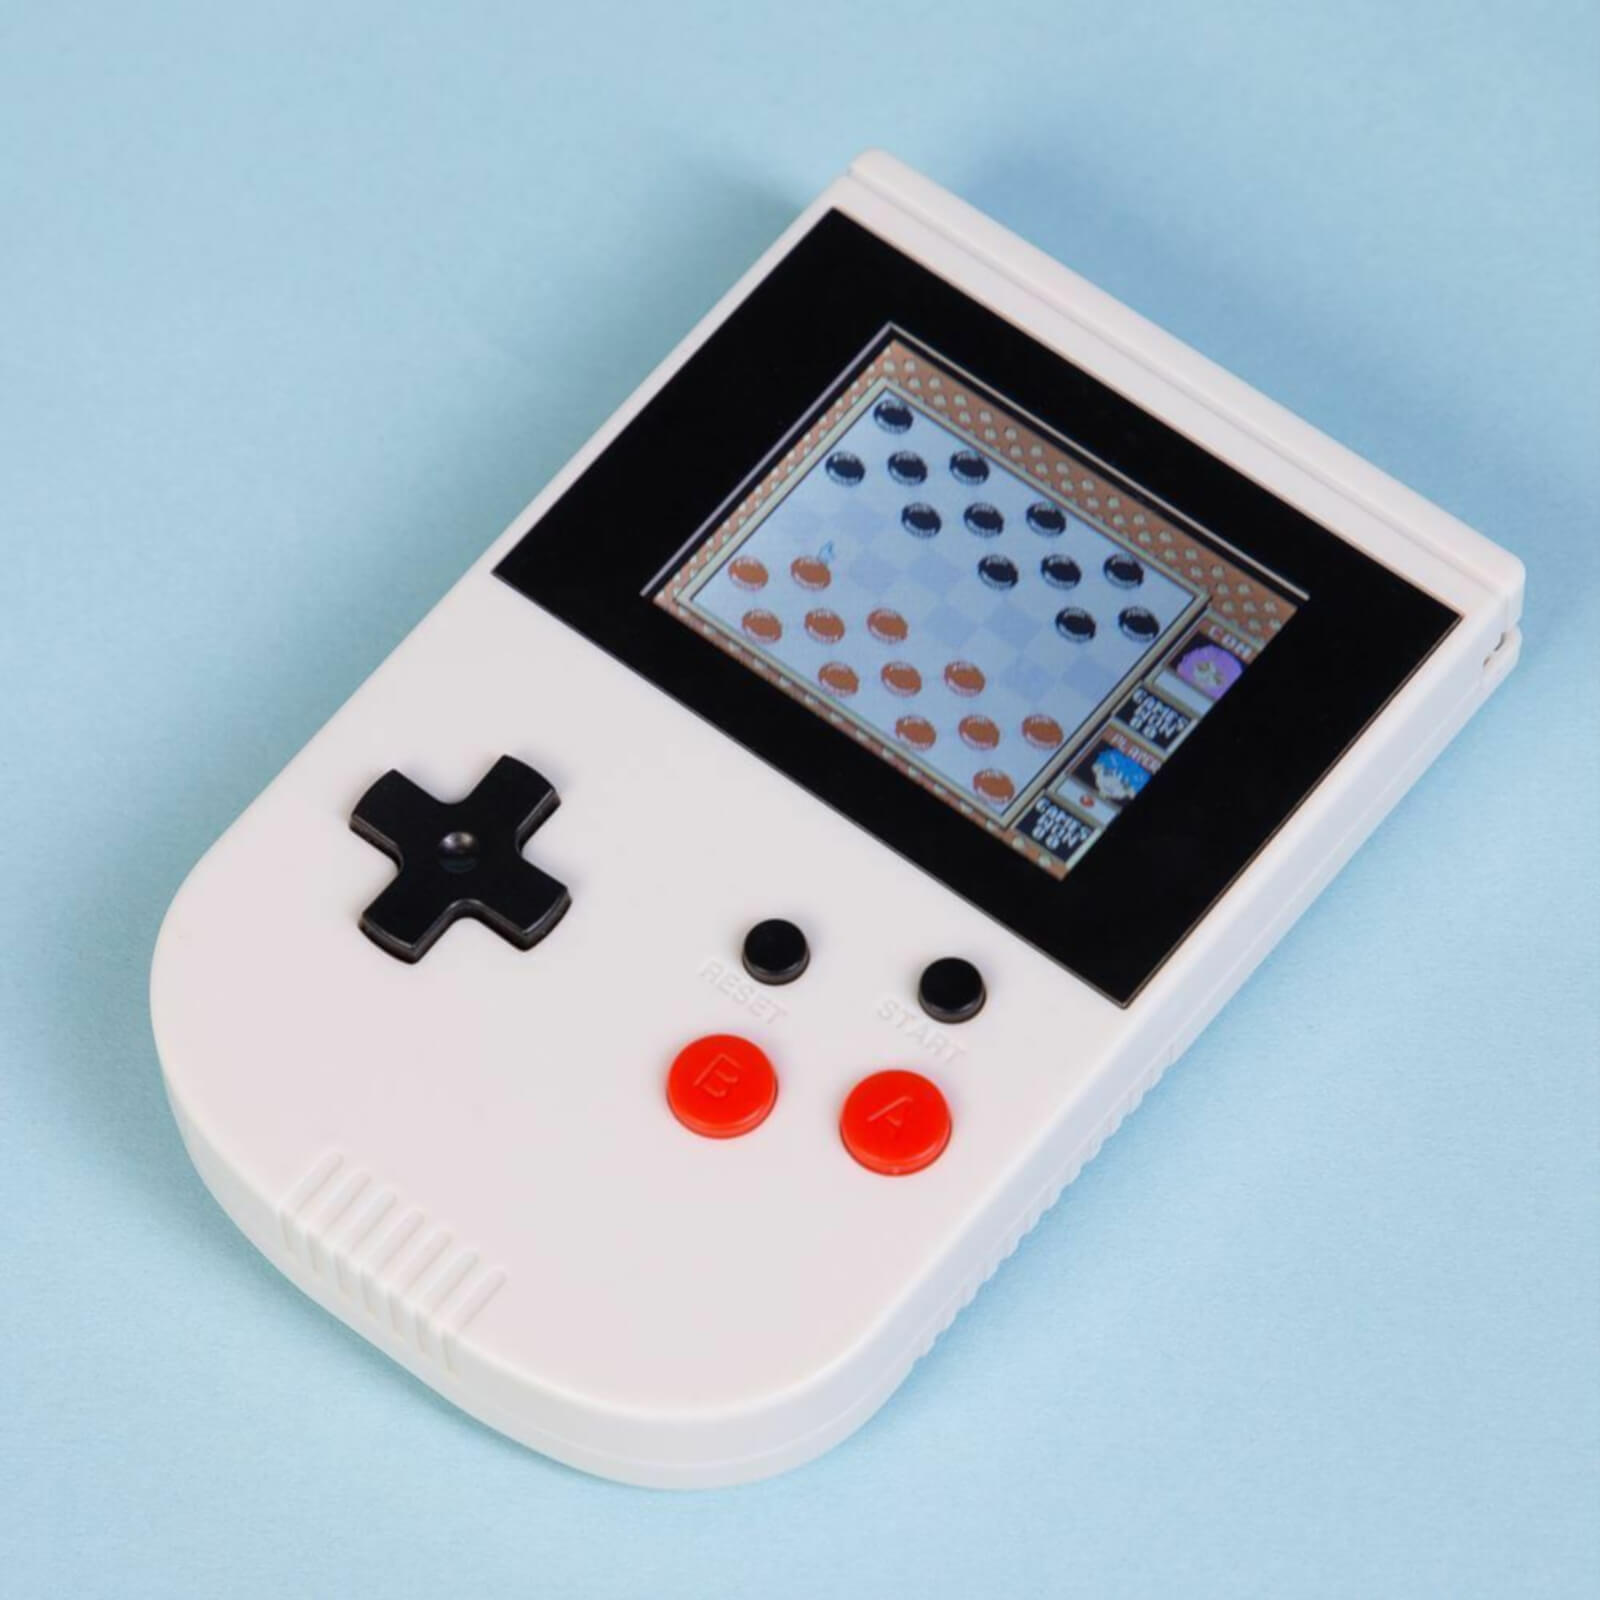 Image of Handheld Arcade Game